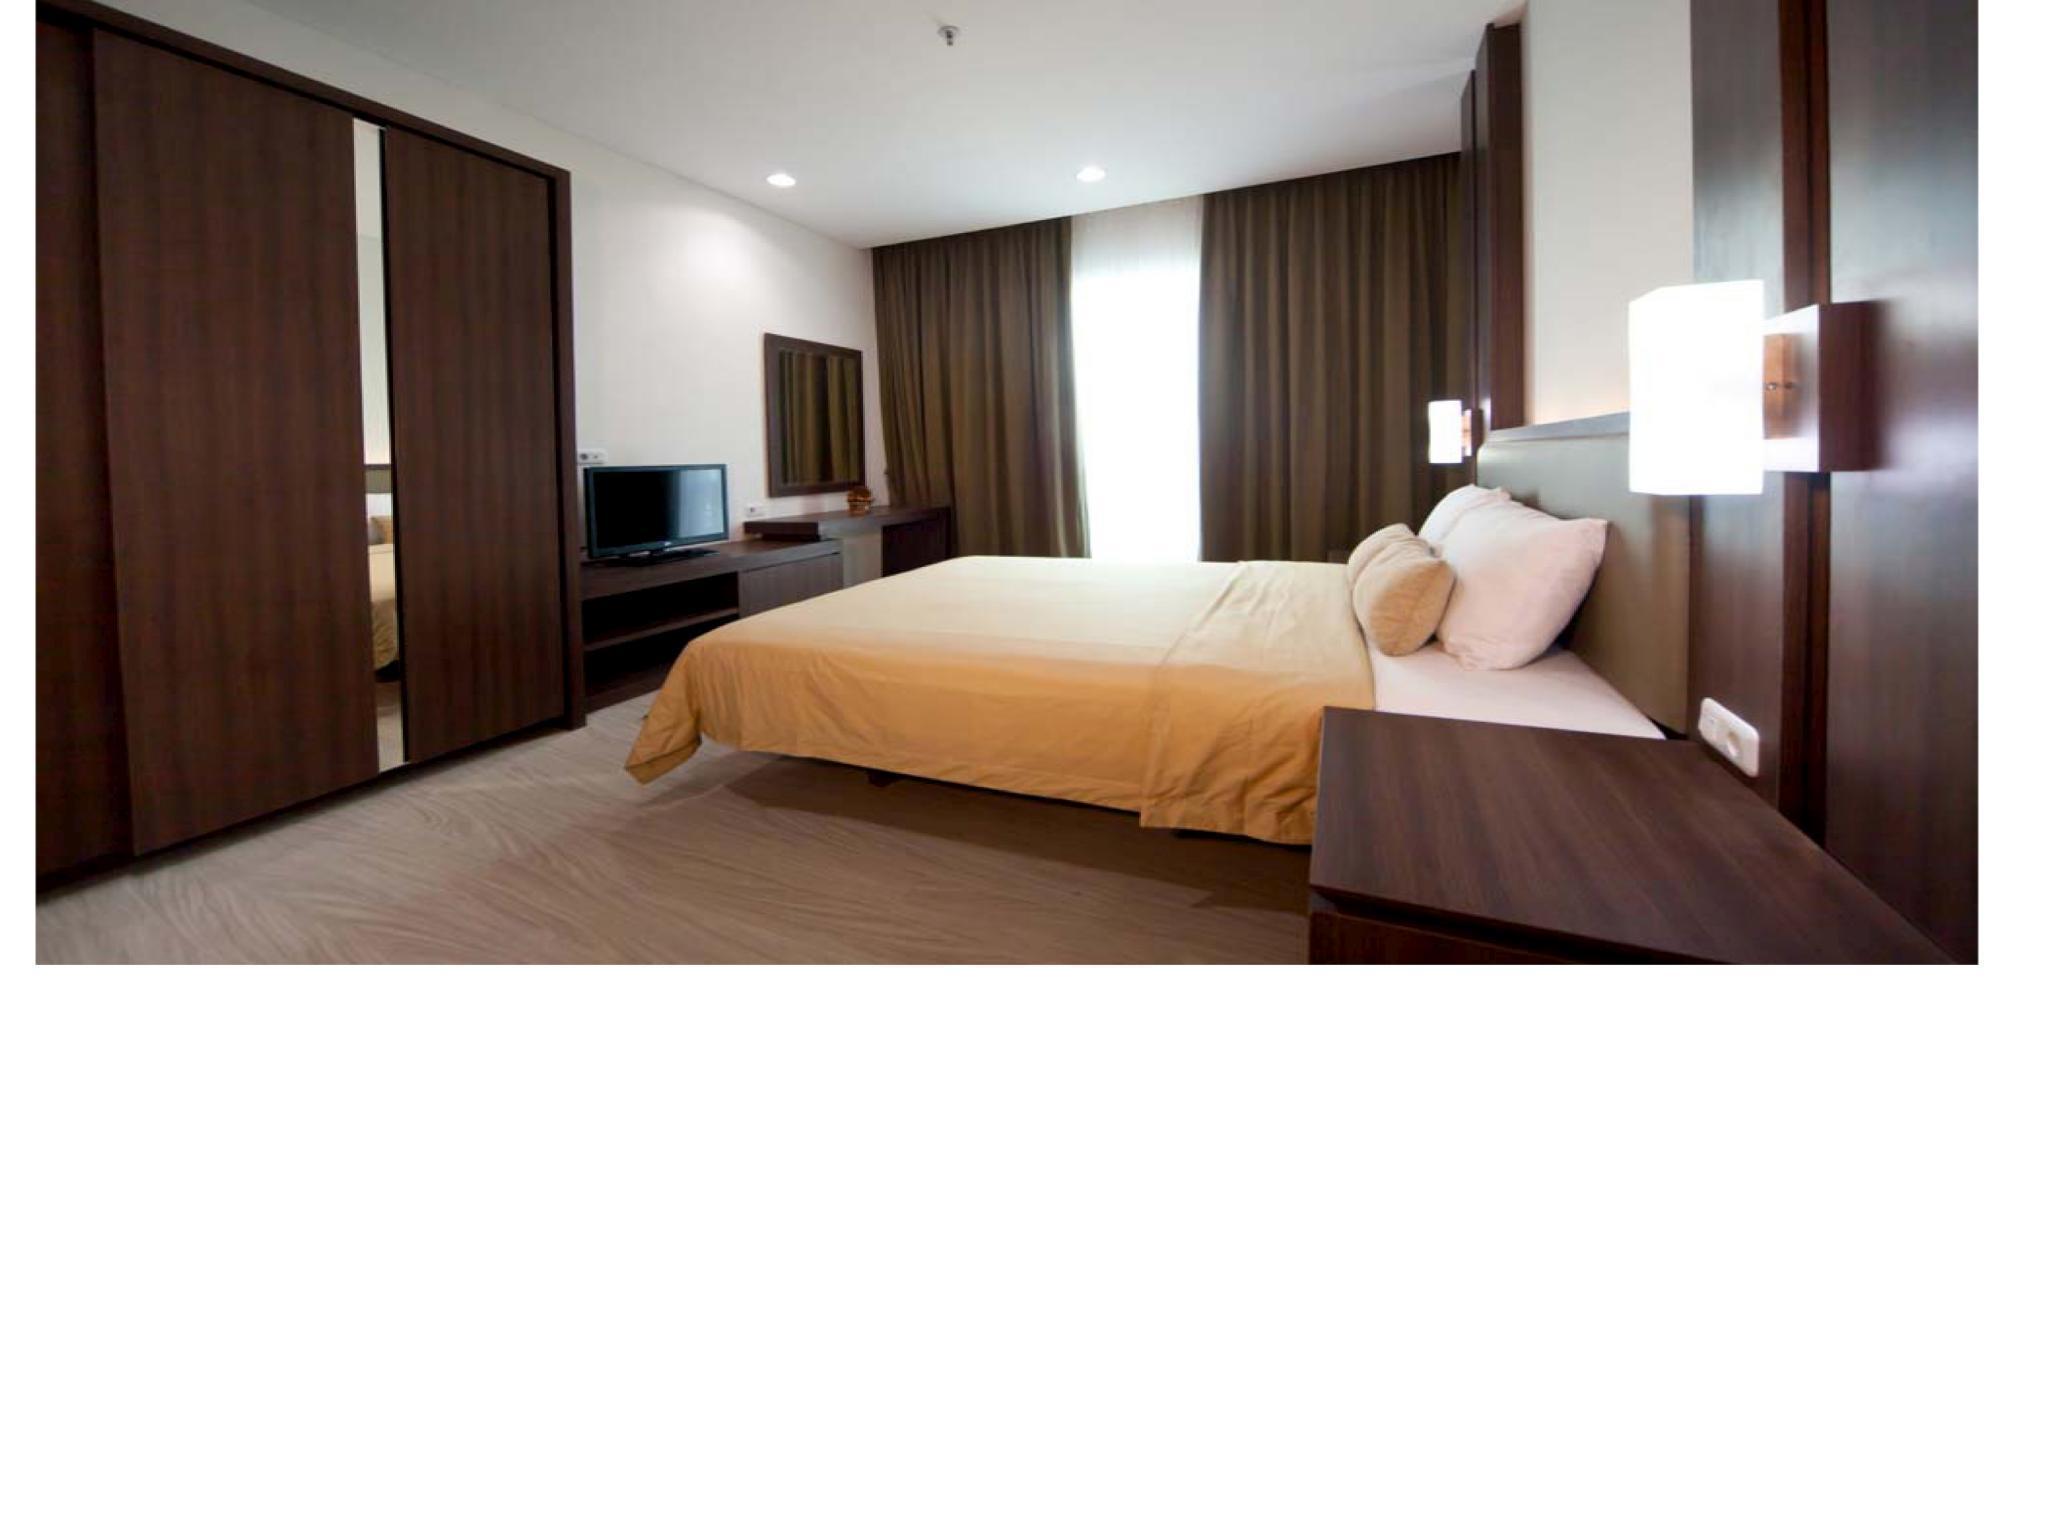 3 BR Pejaten Indah Apartment Room 02